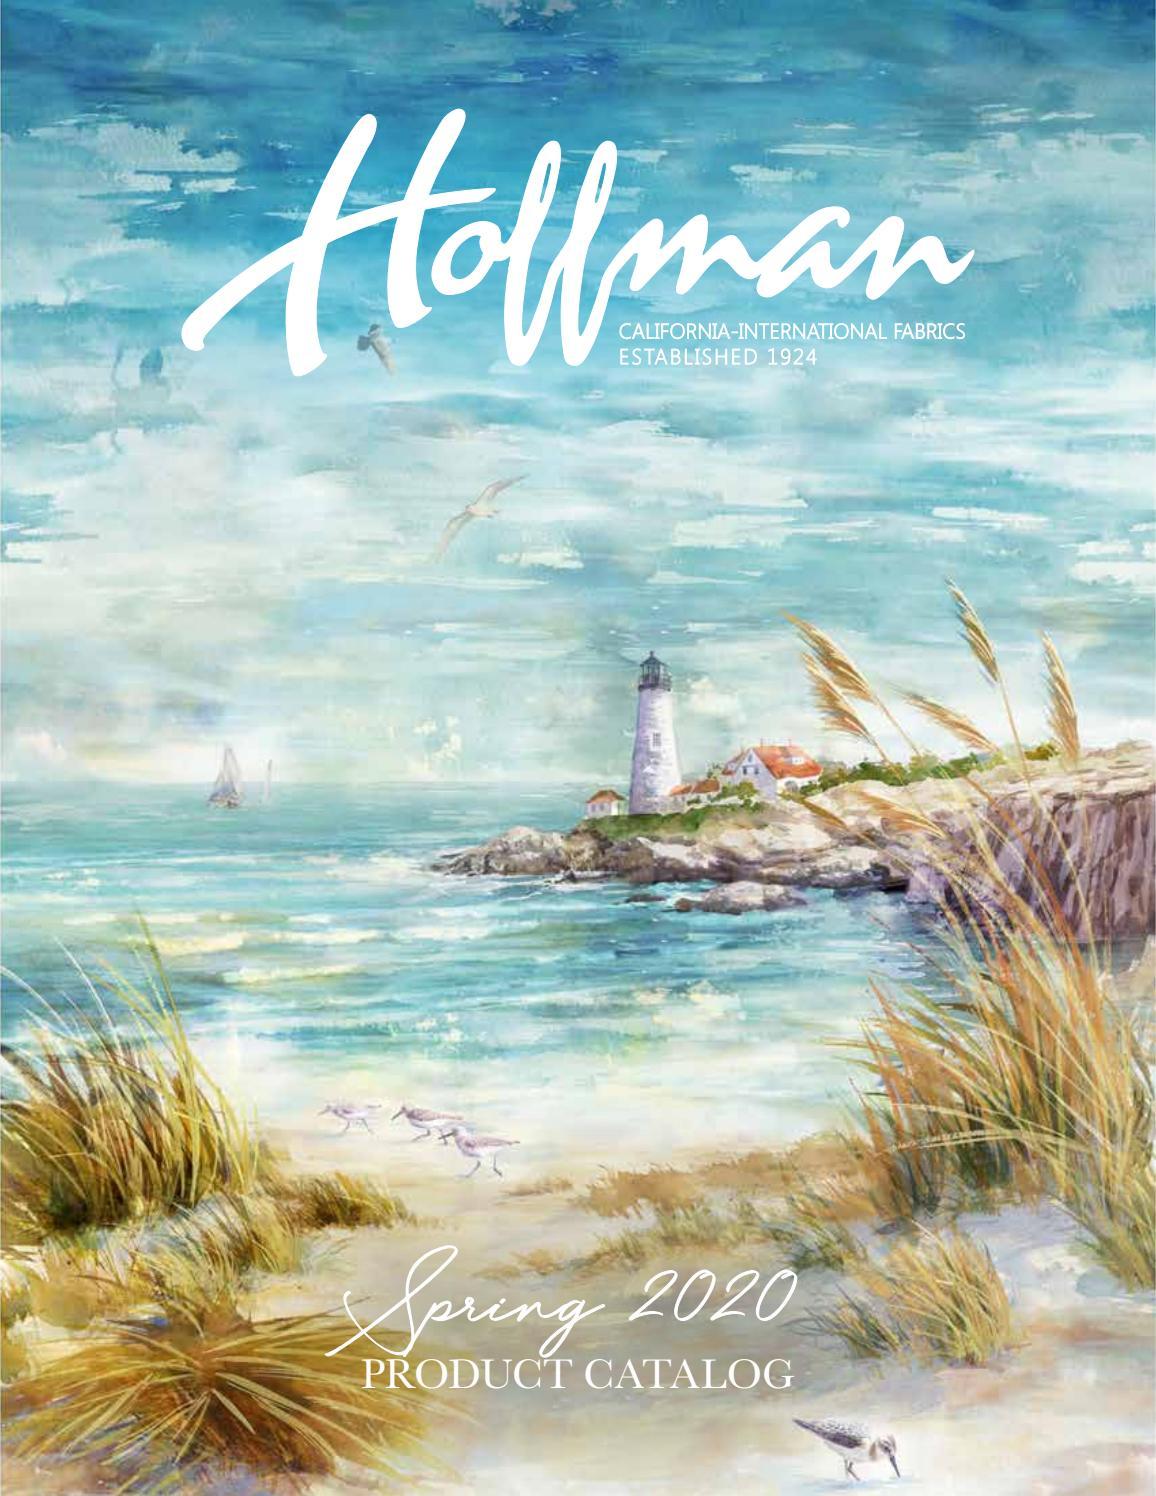 Hoffman Fabrics Spring 2020 Product Catalog By Hoffman California Fabrics Issuu